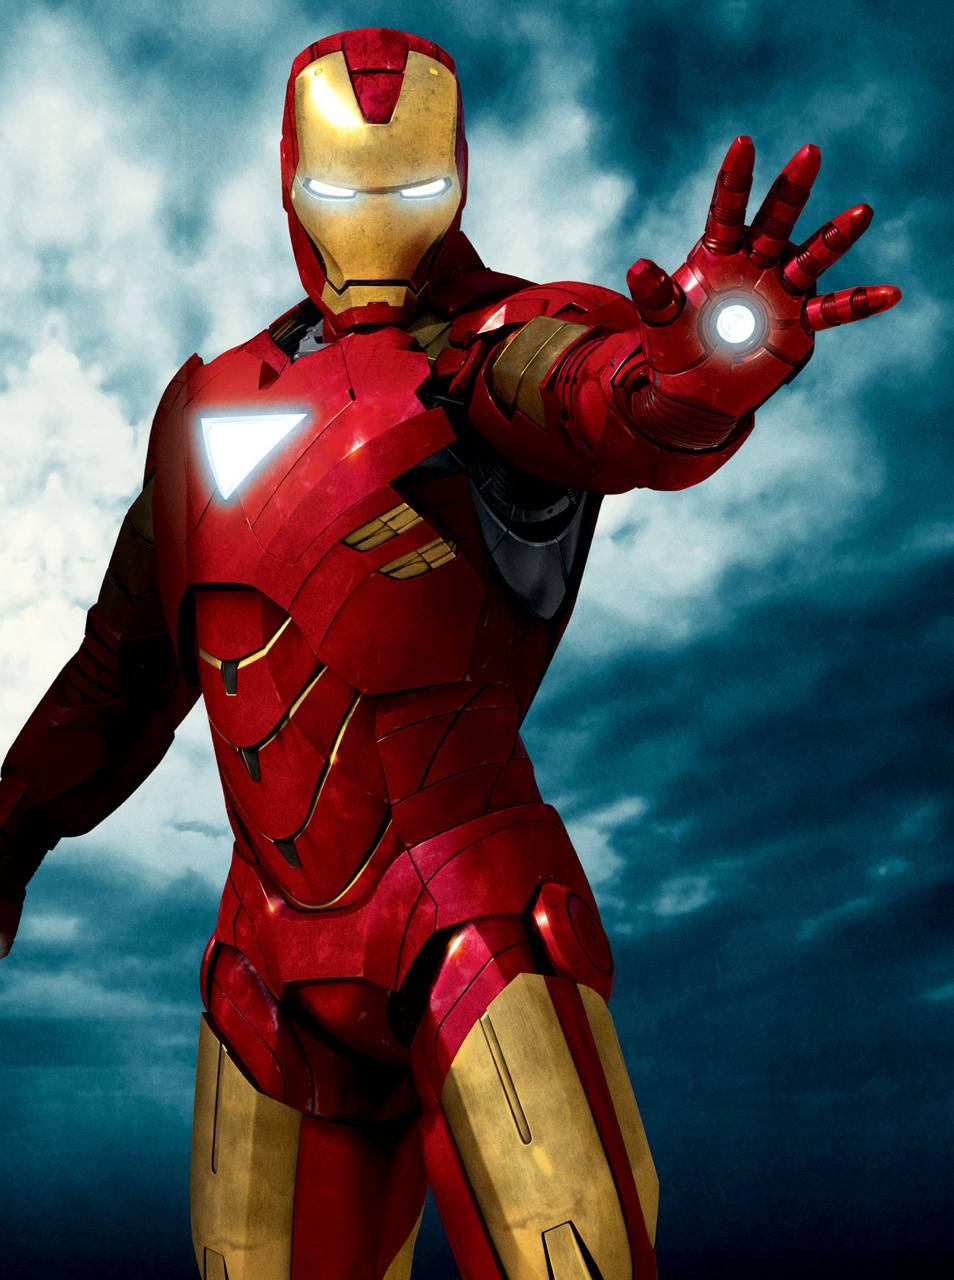 Iron Man 3 Hd Wallpaper By Dhanush Fanz 1b Free On Zedge